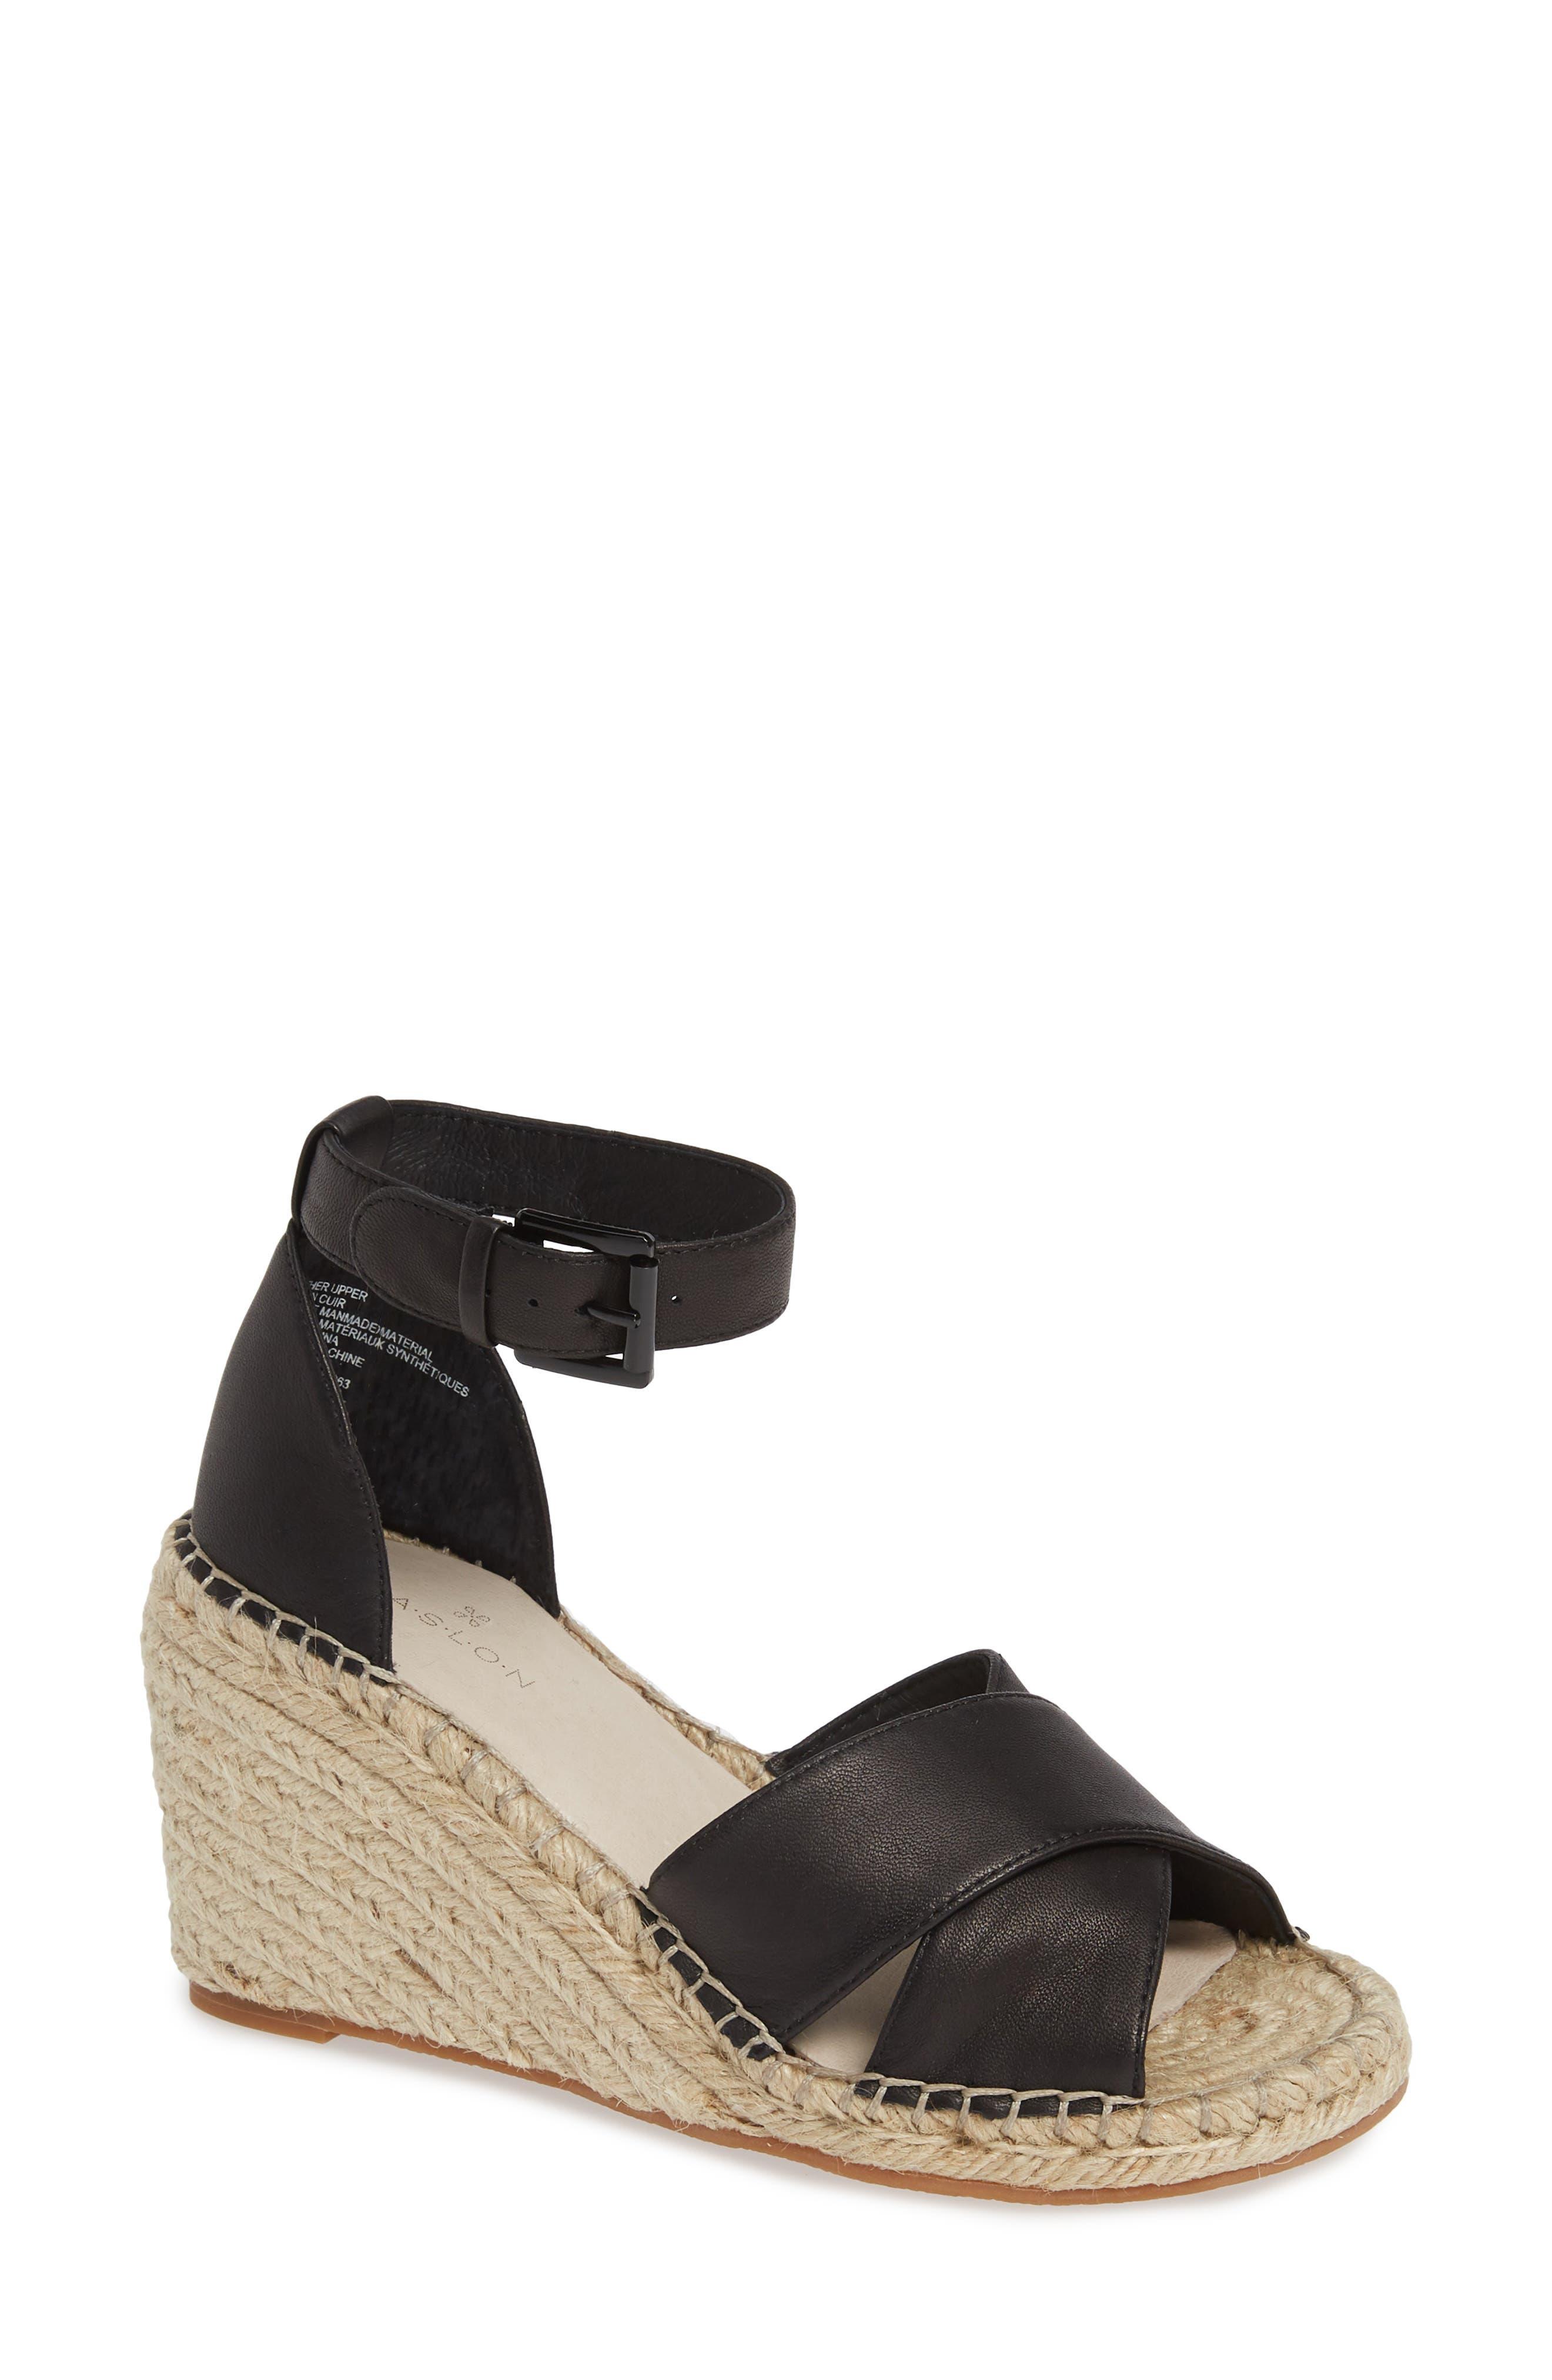 Shiloh Espadrille Sandal, Main, color, BLACK LEATHER